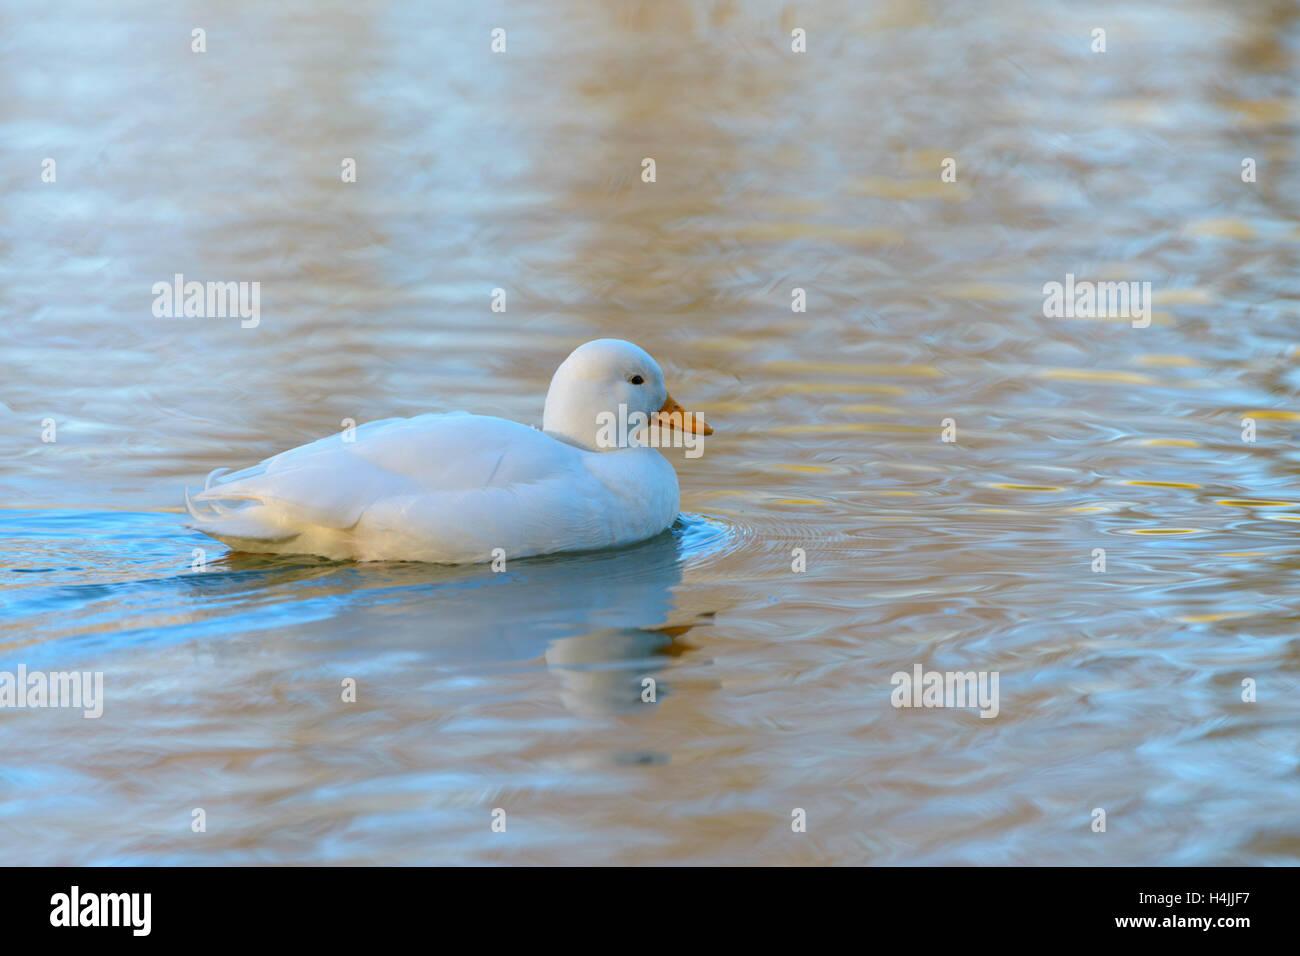 White duck (Anatidae), domestic duck in water, Bavaria, Germany - Stock Image